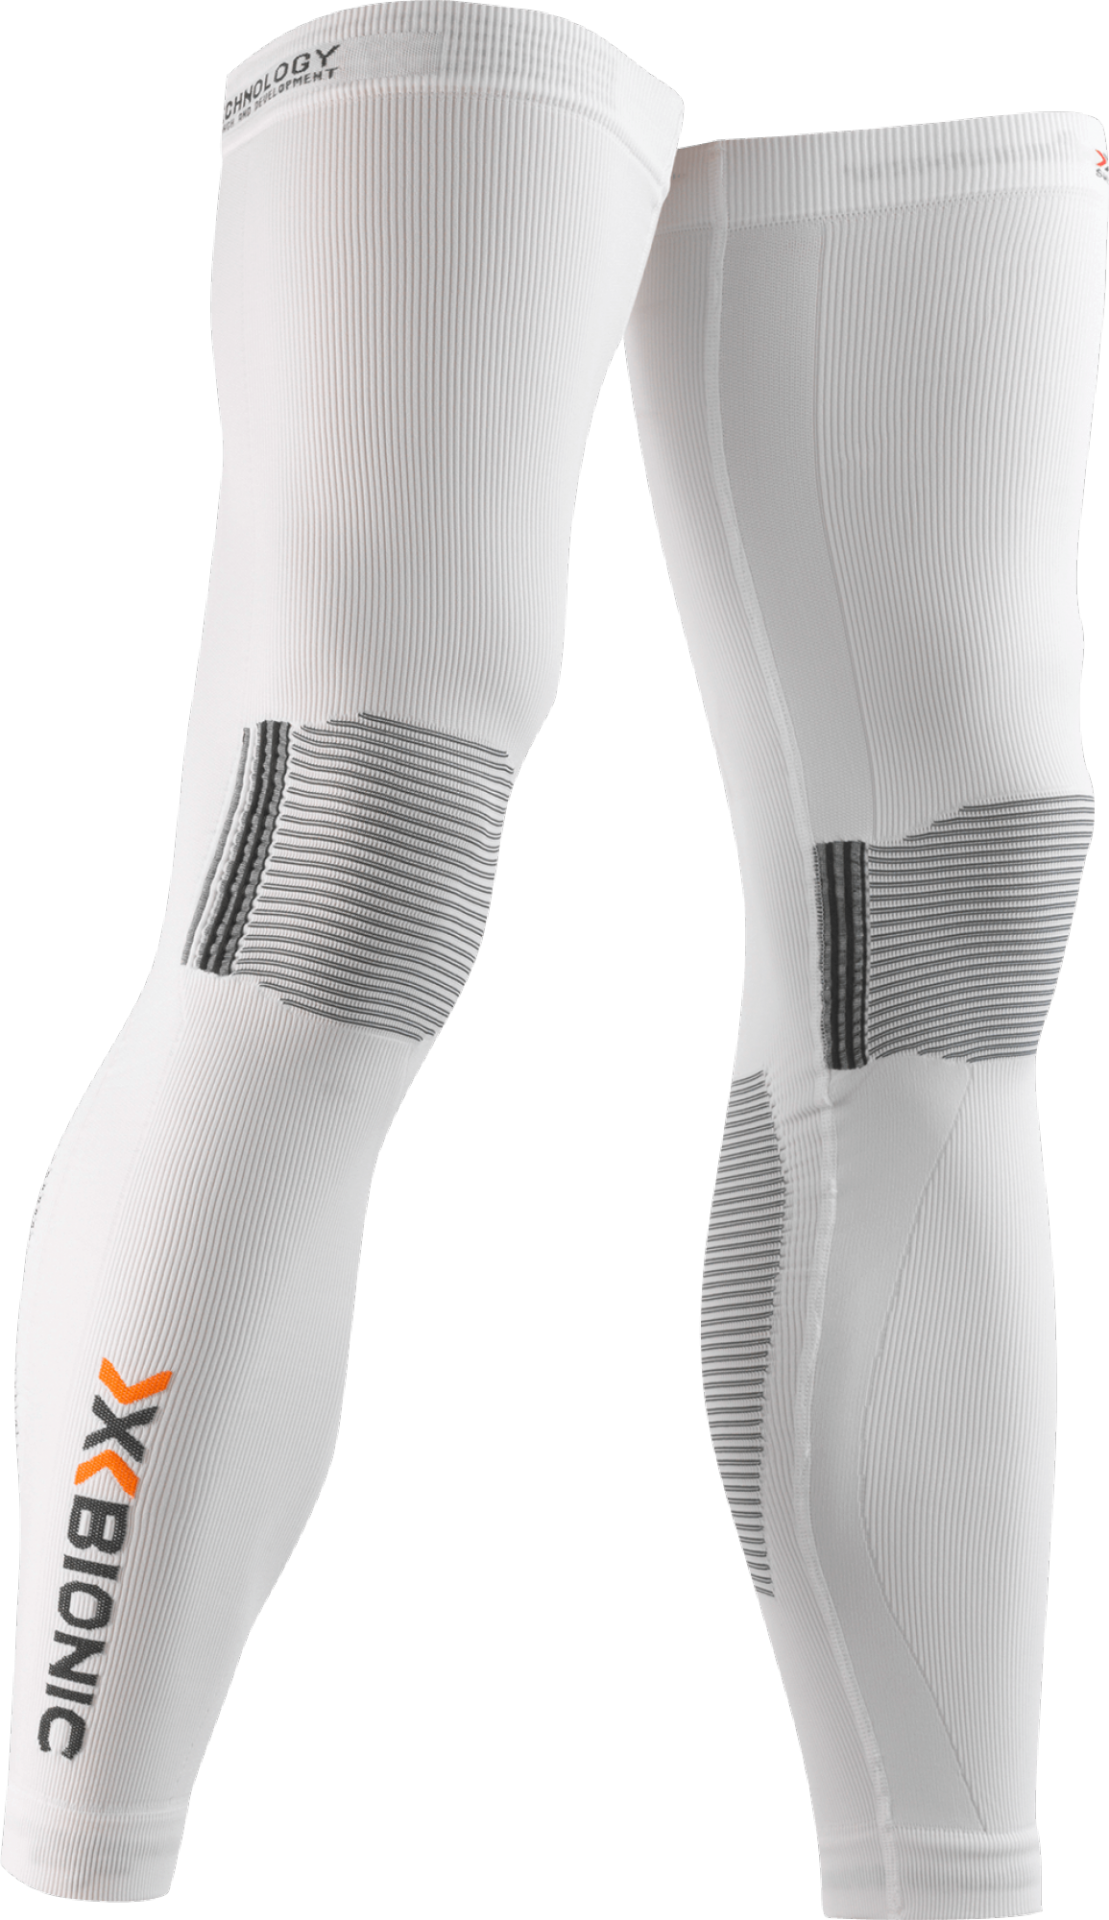 X-Bionic Pernitos Energy Accumulator® Summerlight PK-2 Leg Warmer - Branco